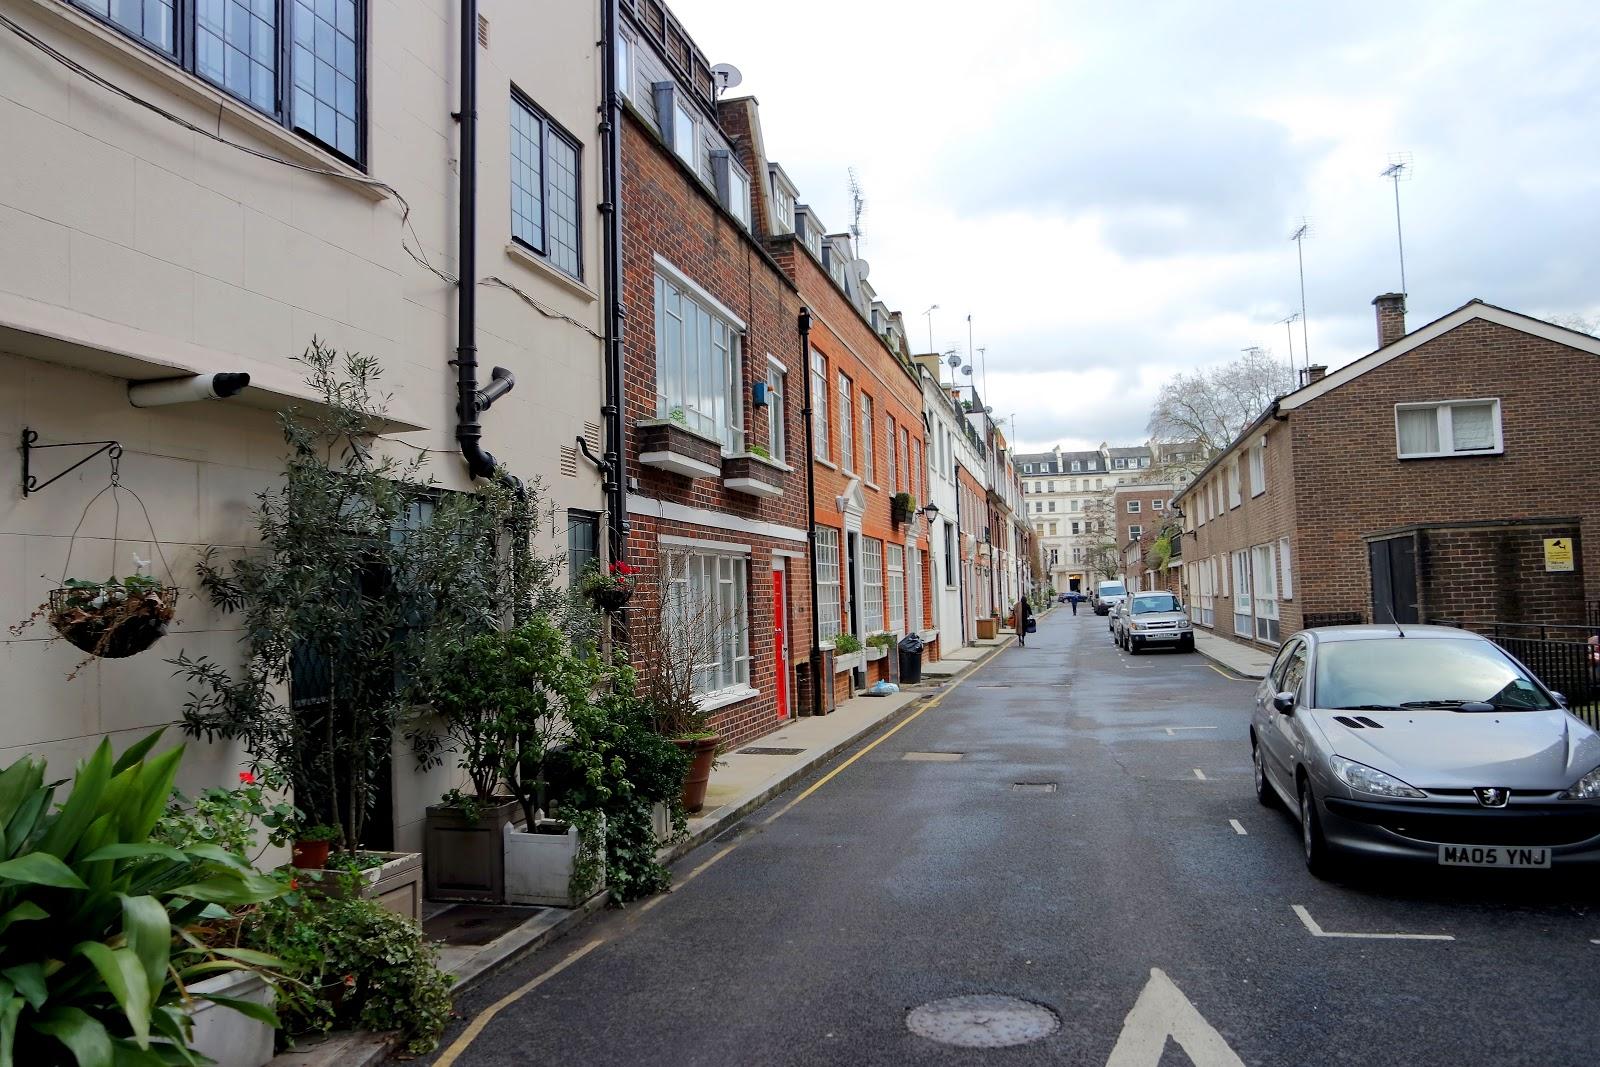 Stanhope Mews E, Queens gate, South Kensington, London, Londres, vlog, blog, travel, travelling, london streets, french,